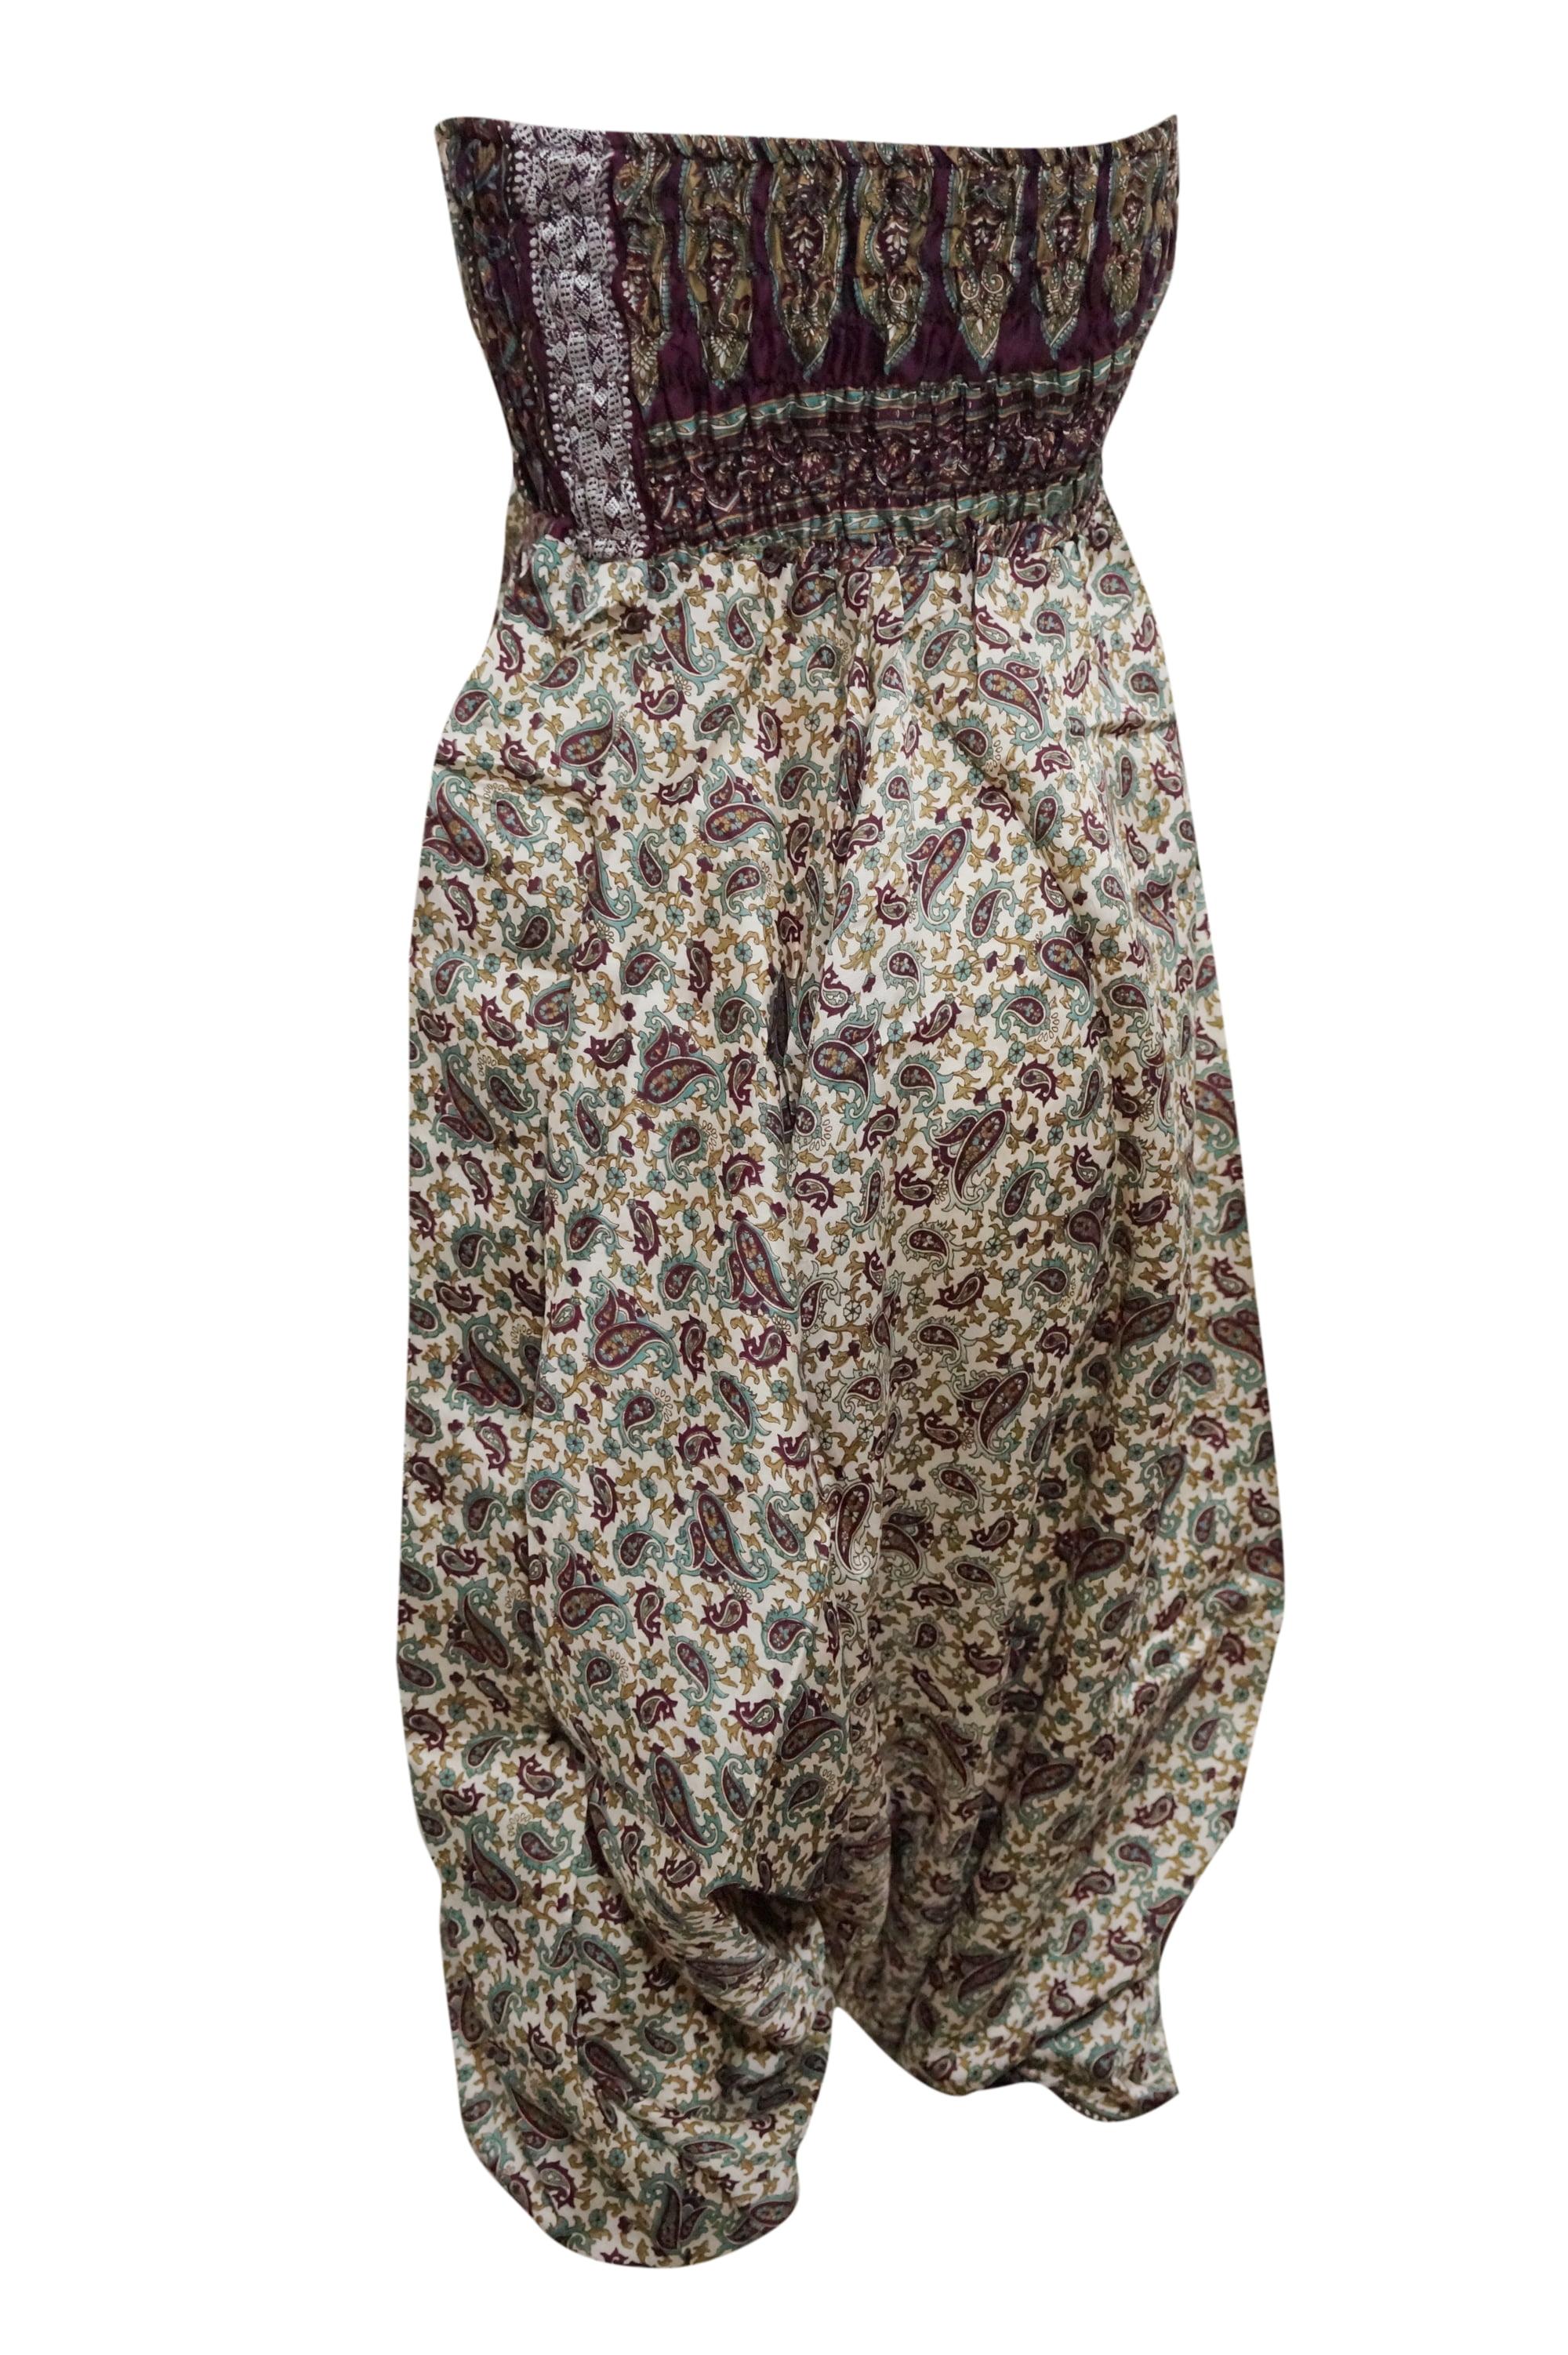 0d03a447d6fb Mogul Interior - Mogul Women s Vintage Harem Pant Pink Beige Silk Sari  Jumpsuit Dress - Walmart.com